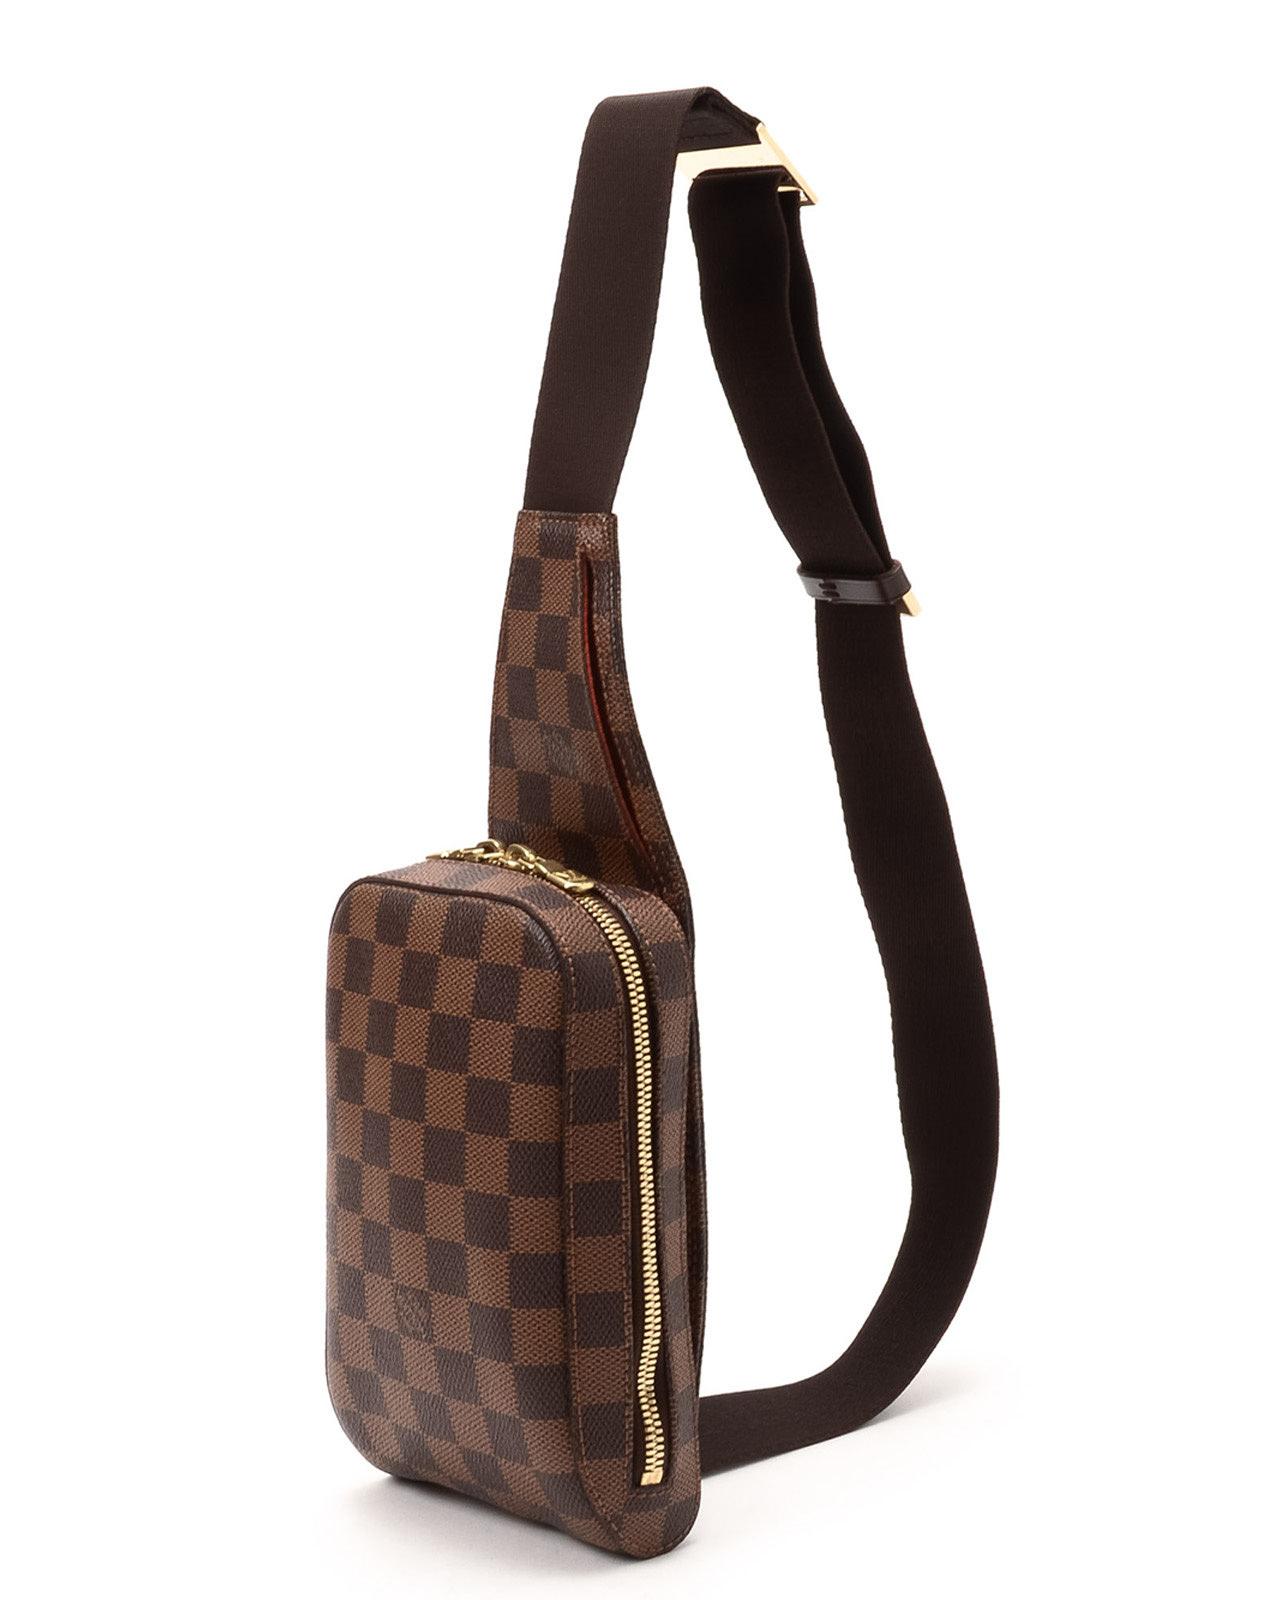 Lyst - Louis Vuitton Damier Ebene Geronimos Bag in Metallic de77b966007f7